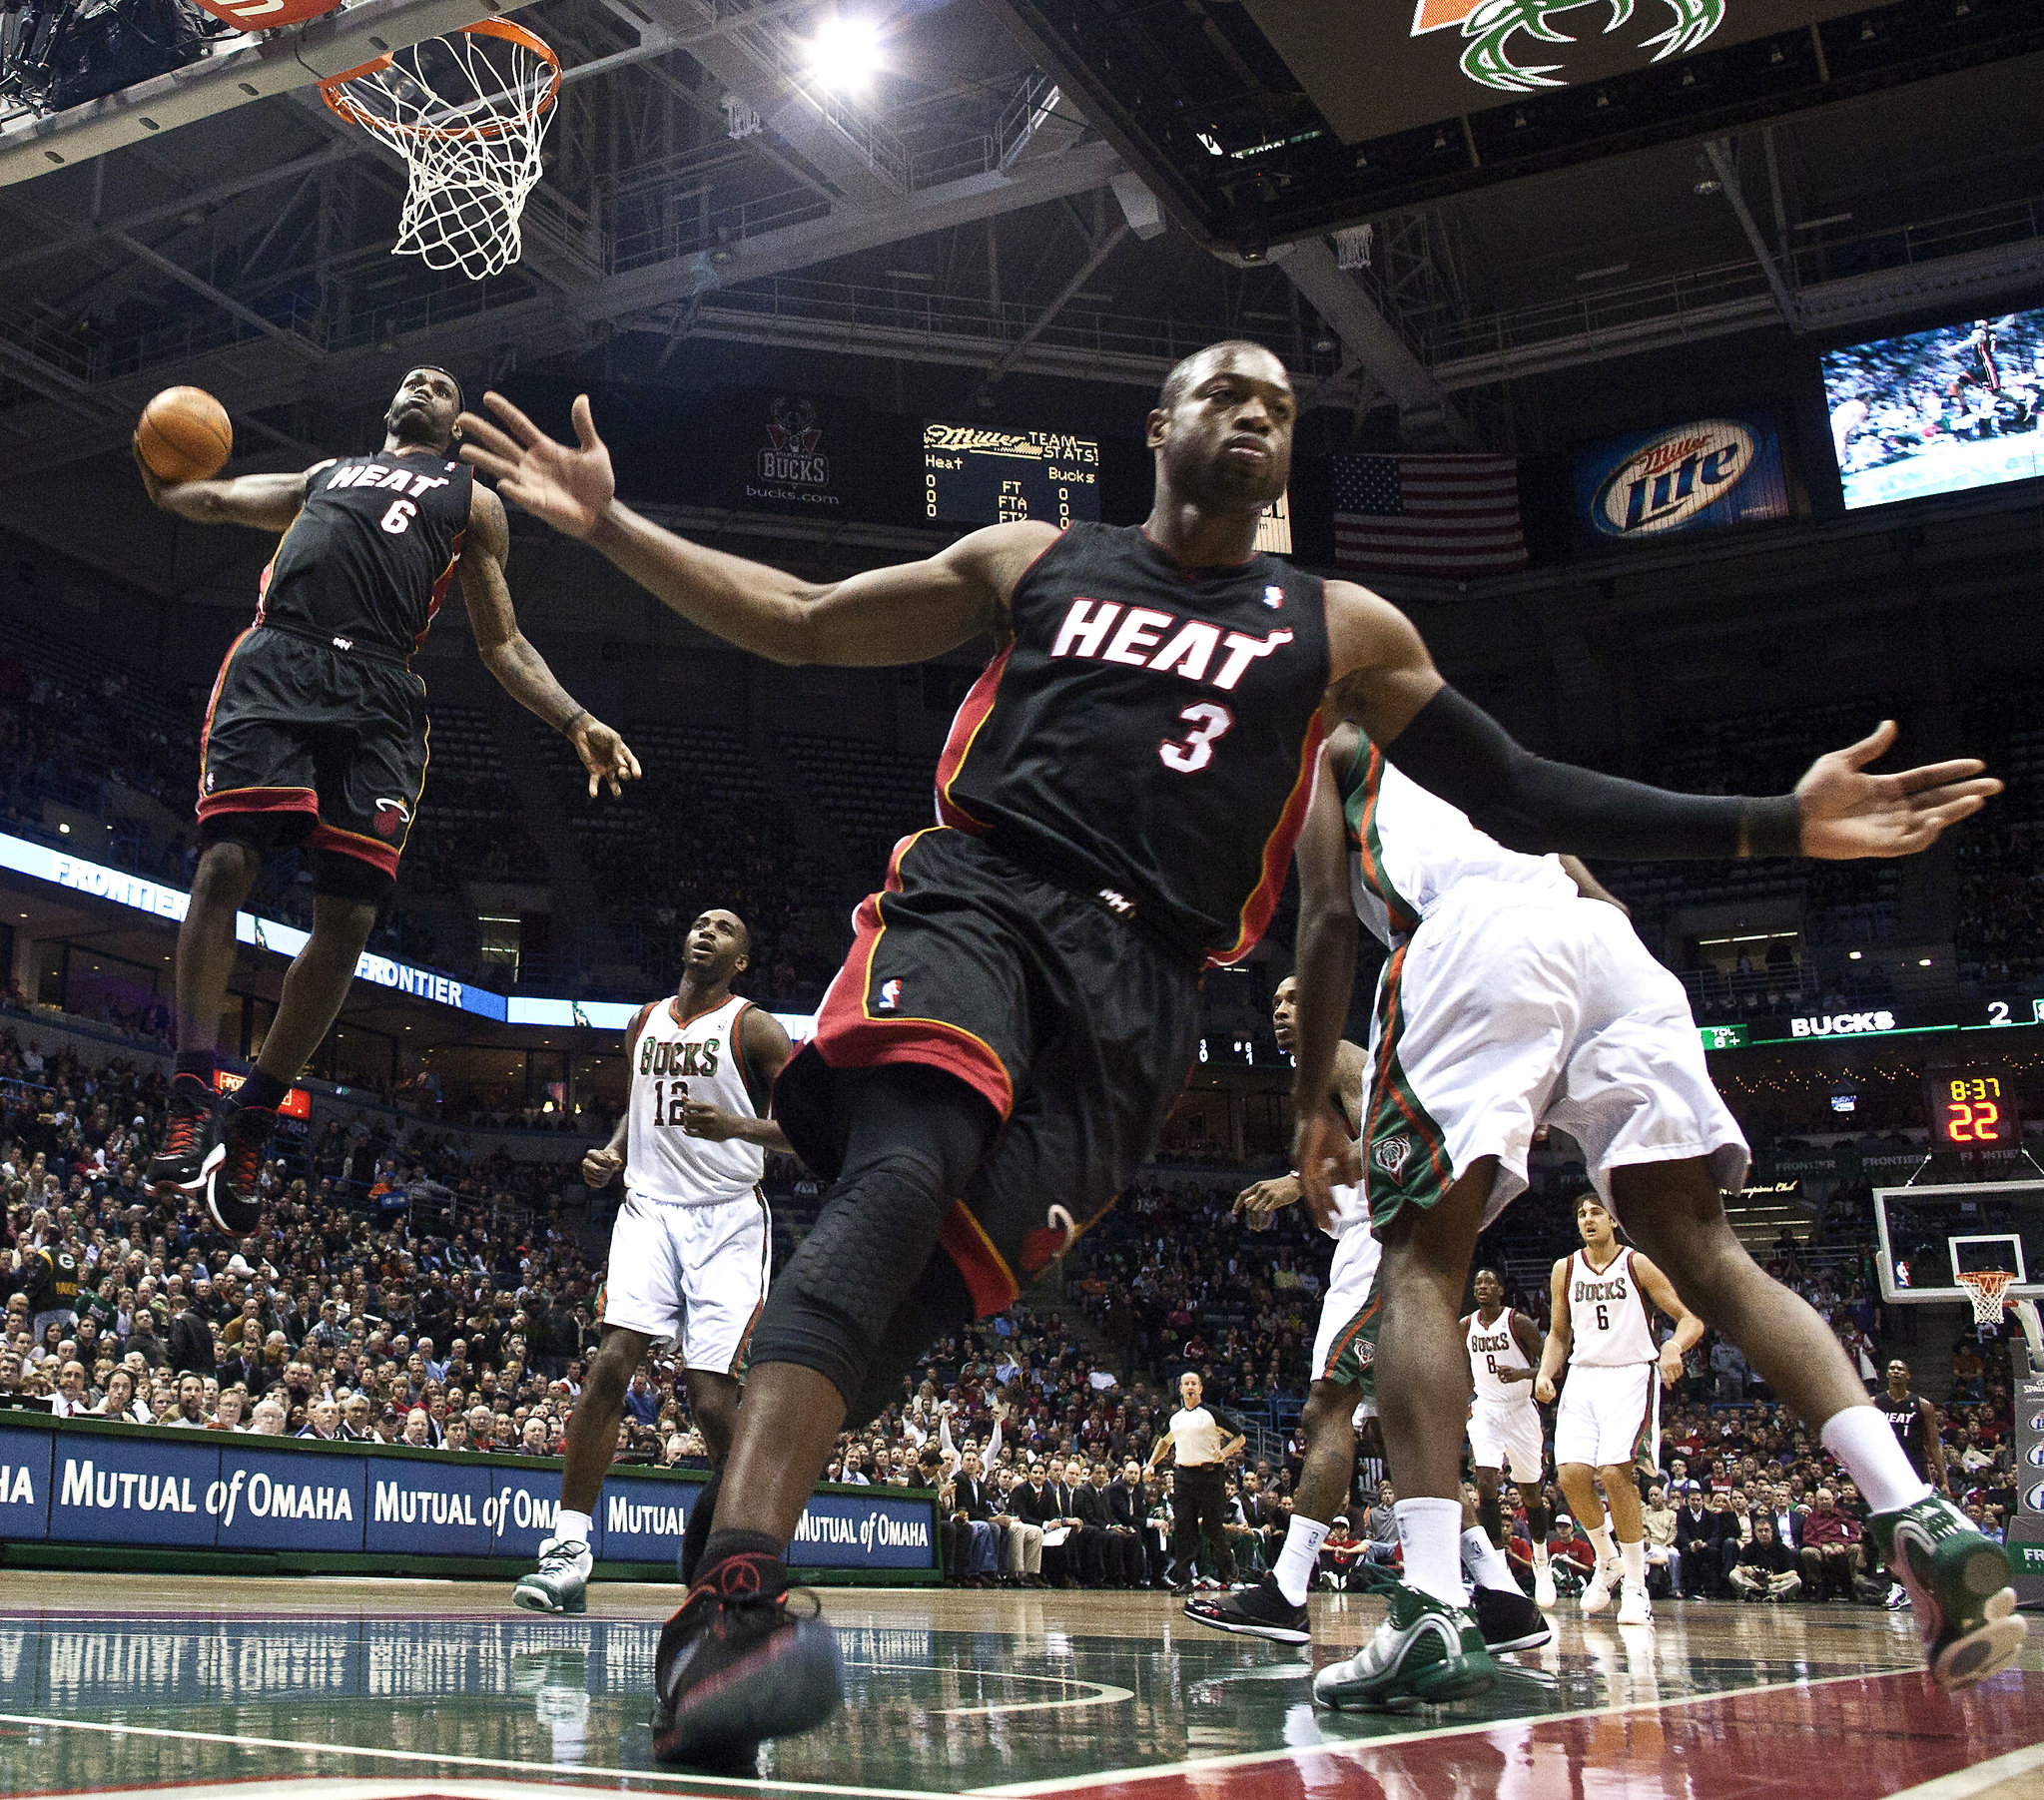 NBA Photography 101 LeBron James dunks on the Warriors 2047x1803